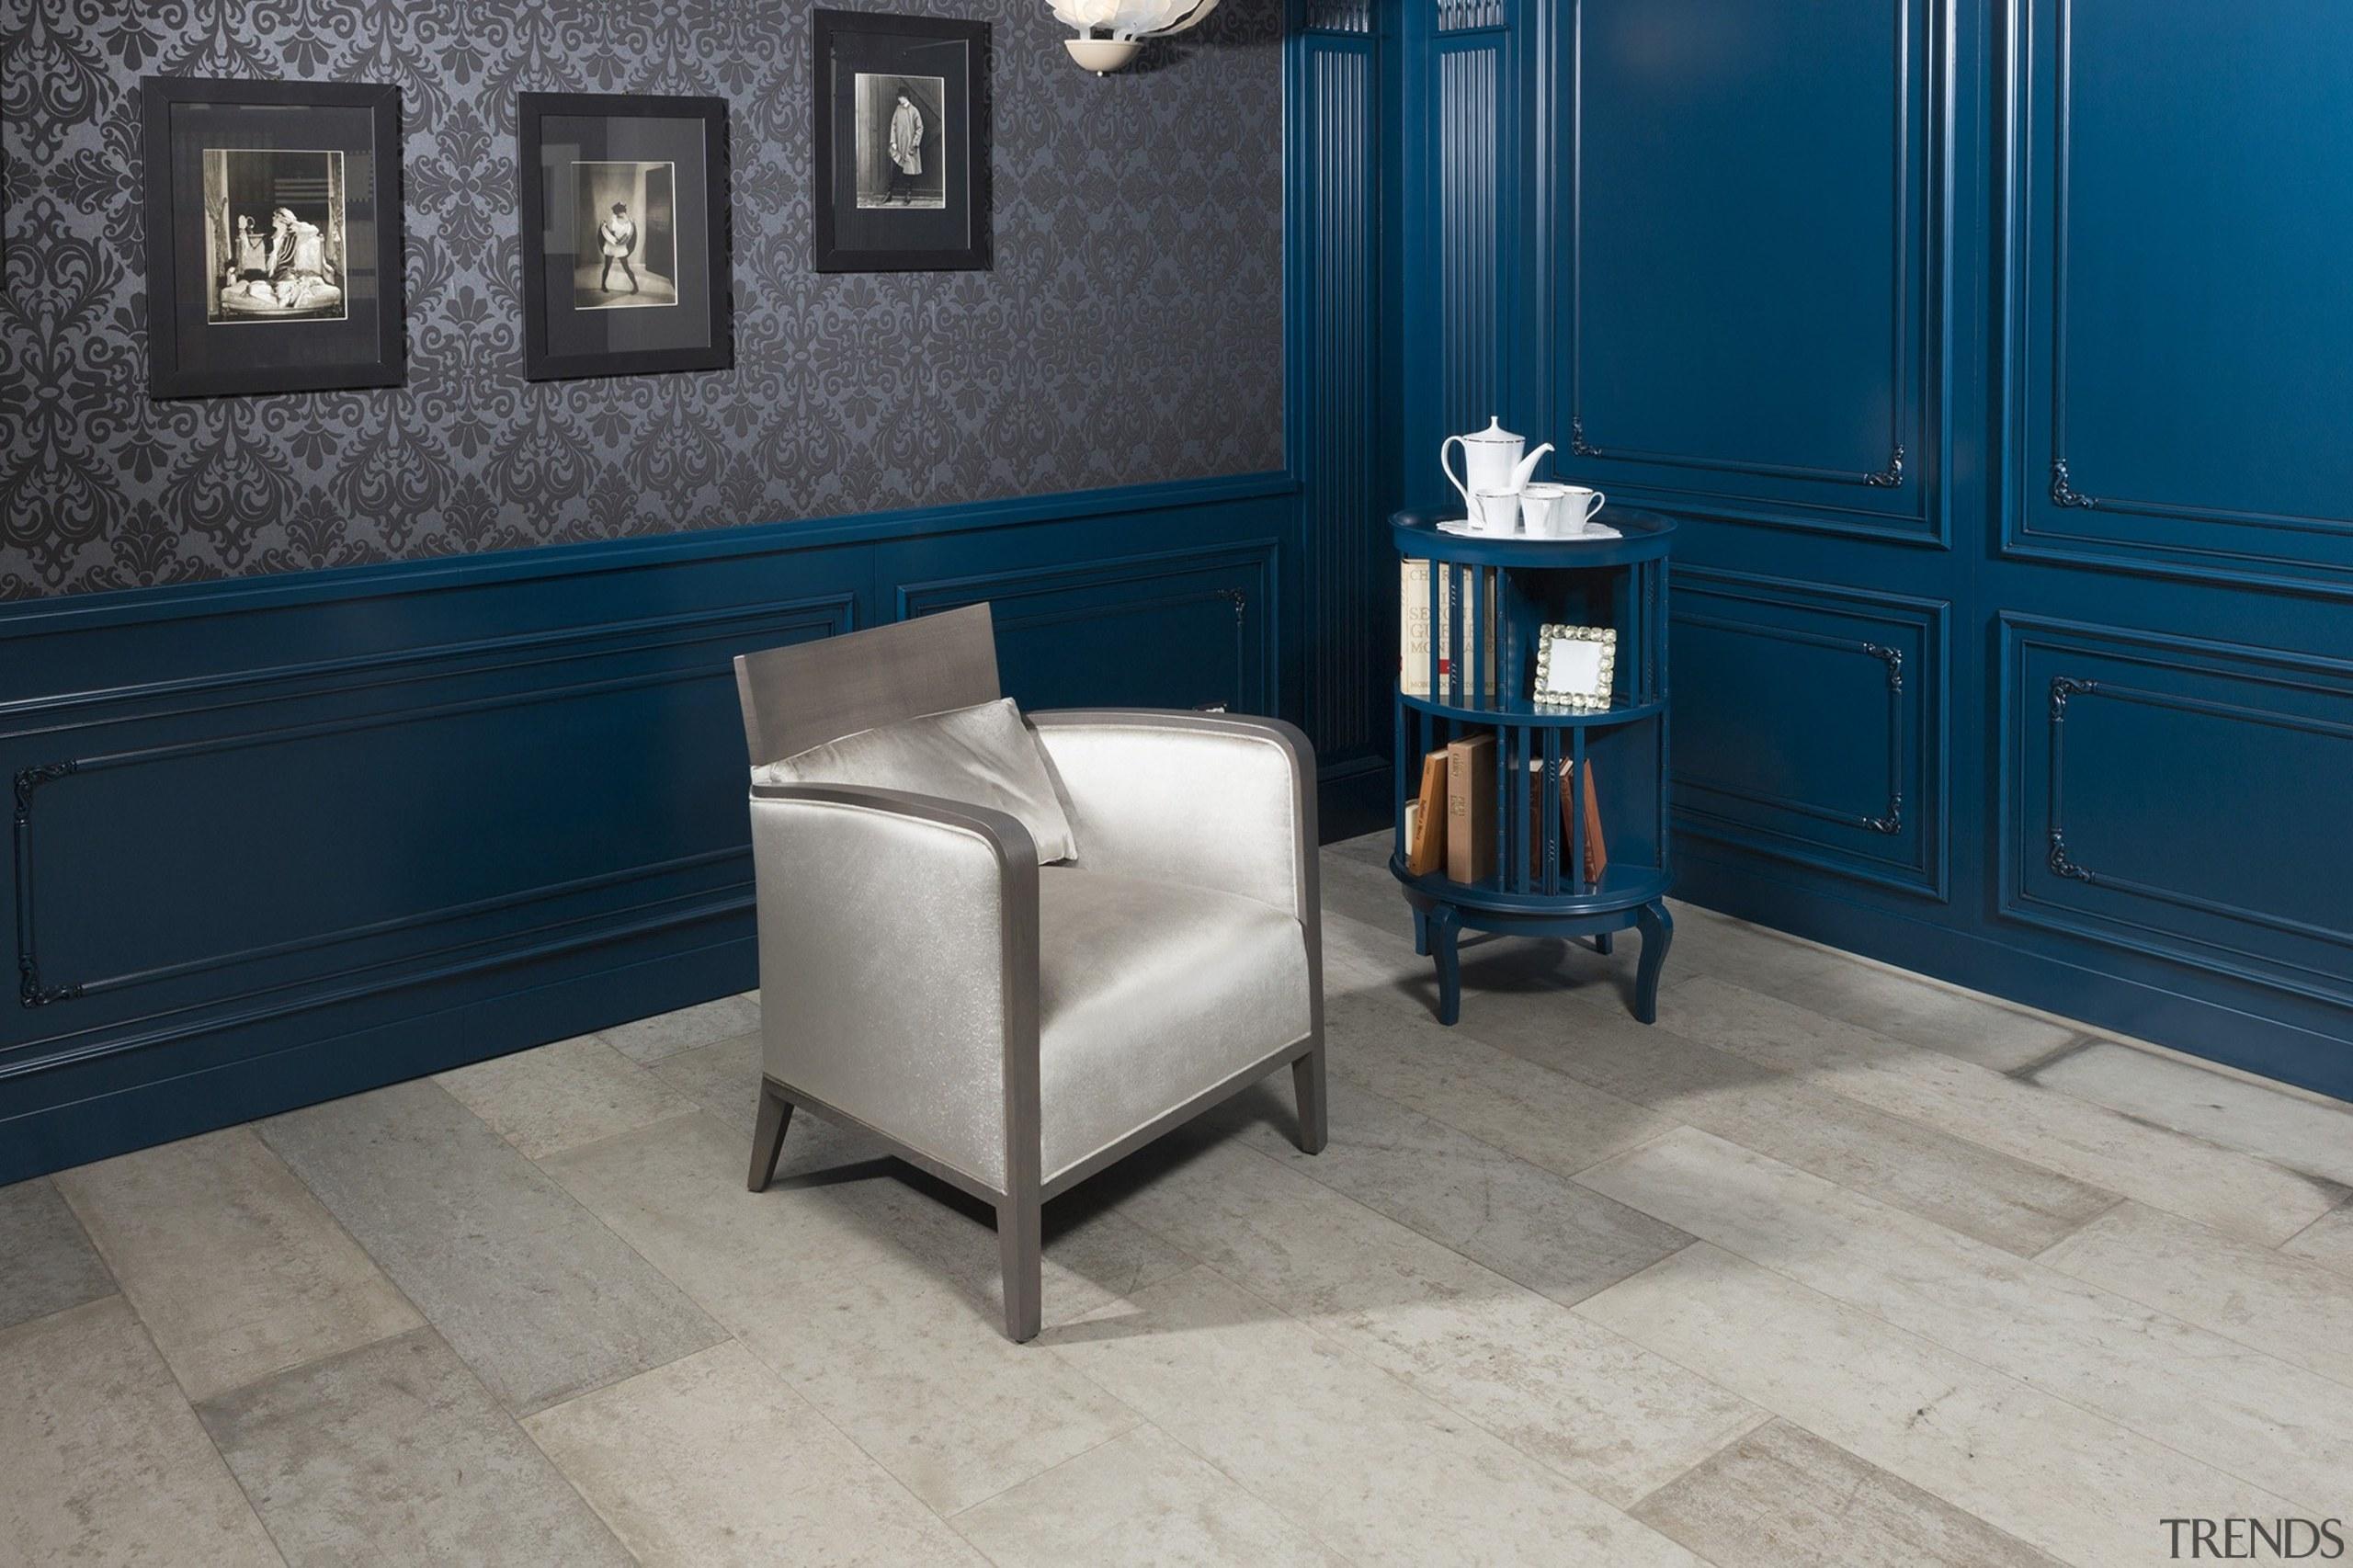 Blue house 2 - Blue house_2 - floor floor, flooring, furniture, hardwood, interior design, room, wall, wood, wood flooring, gray, blue